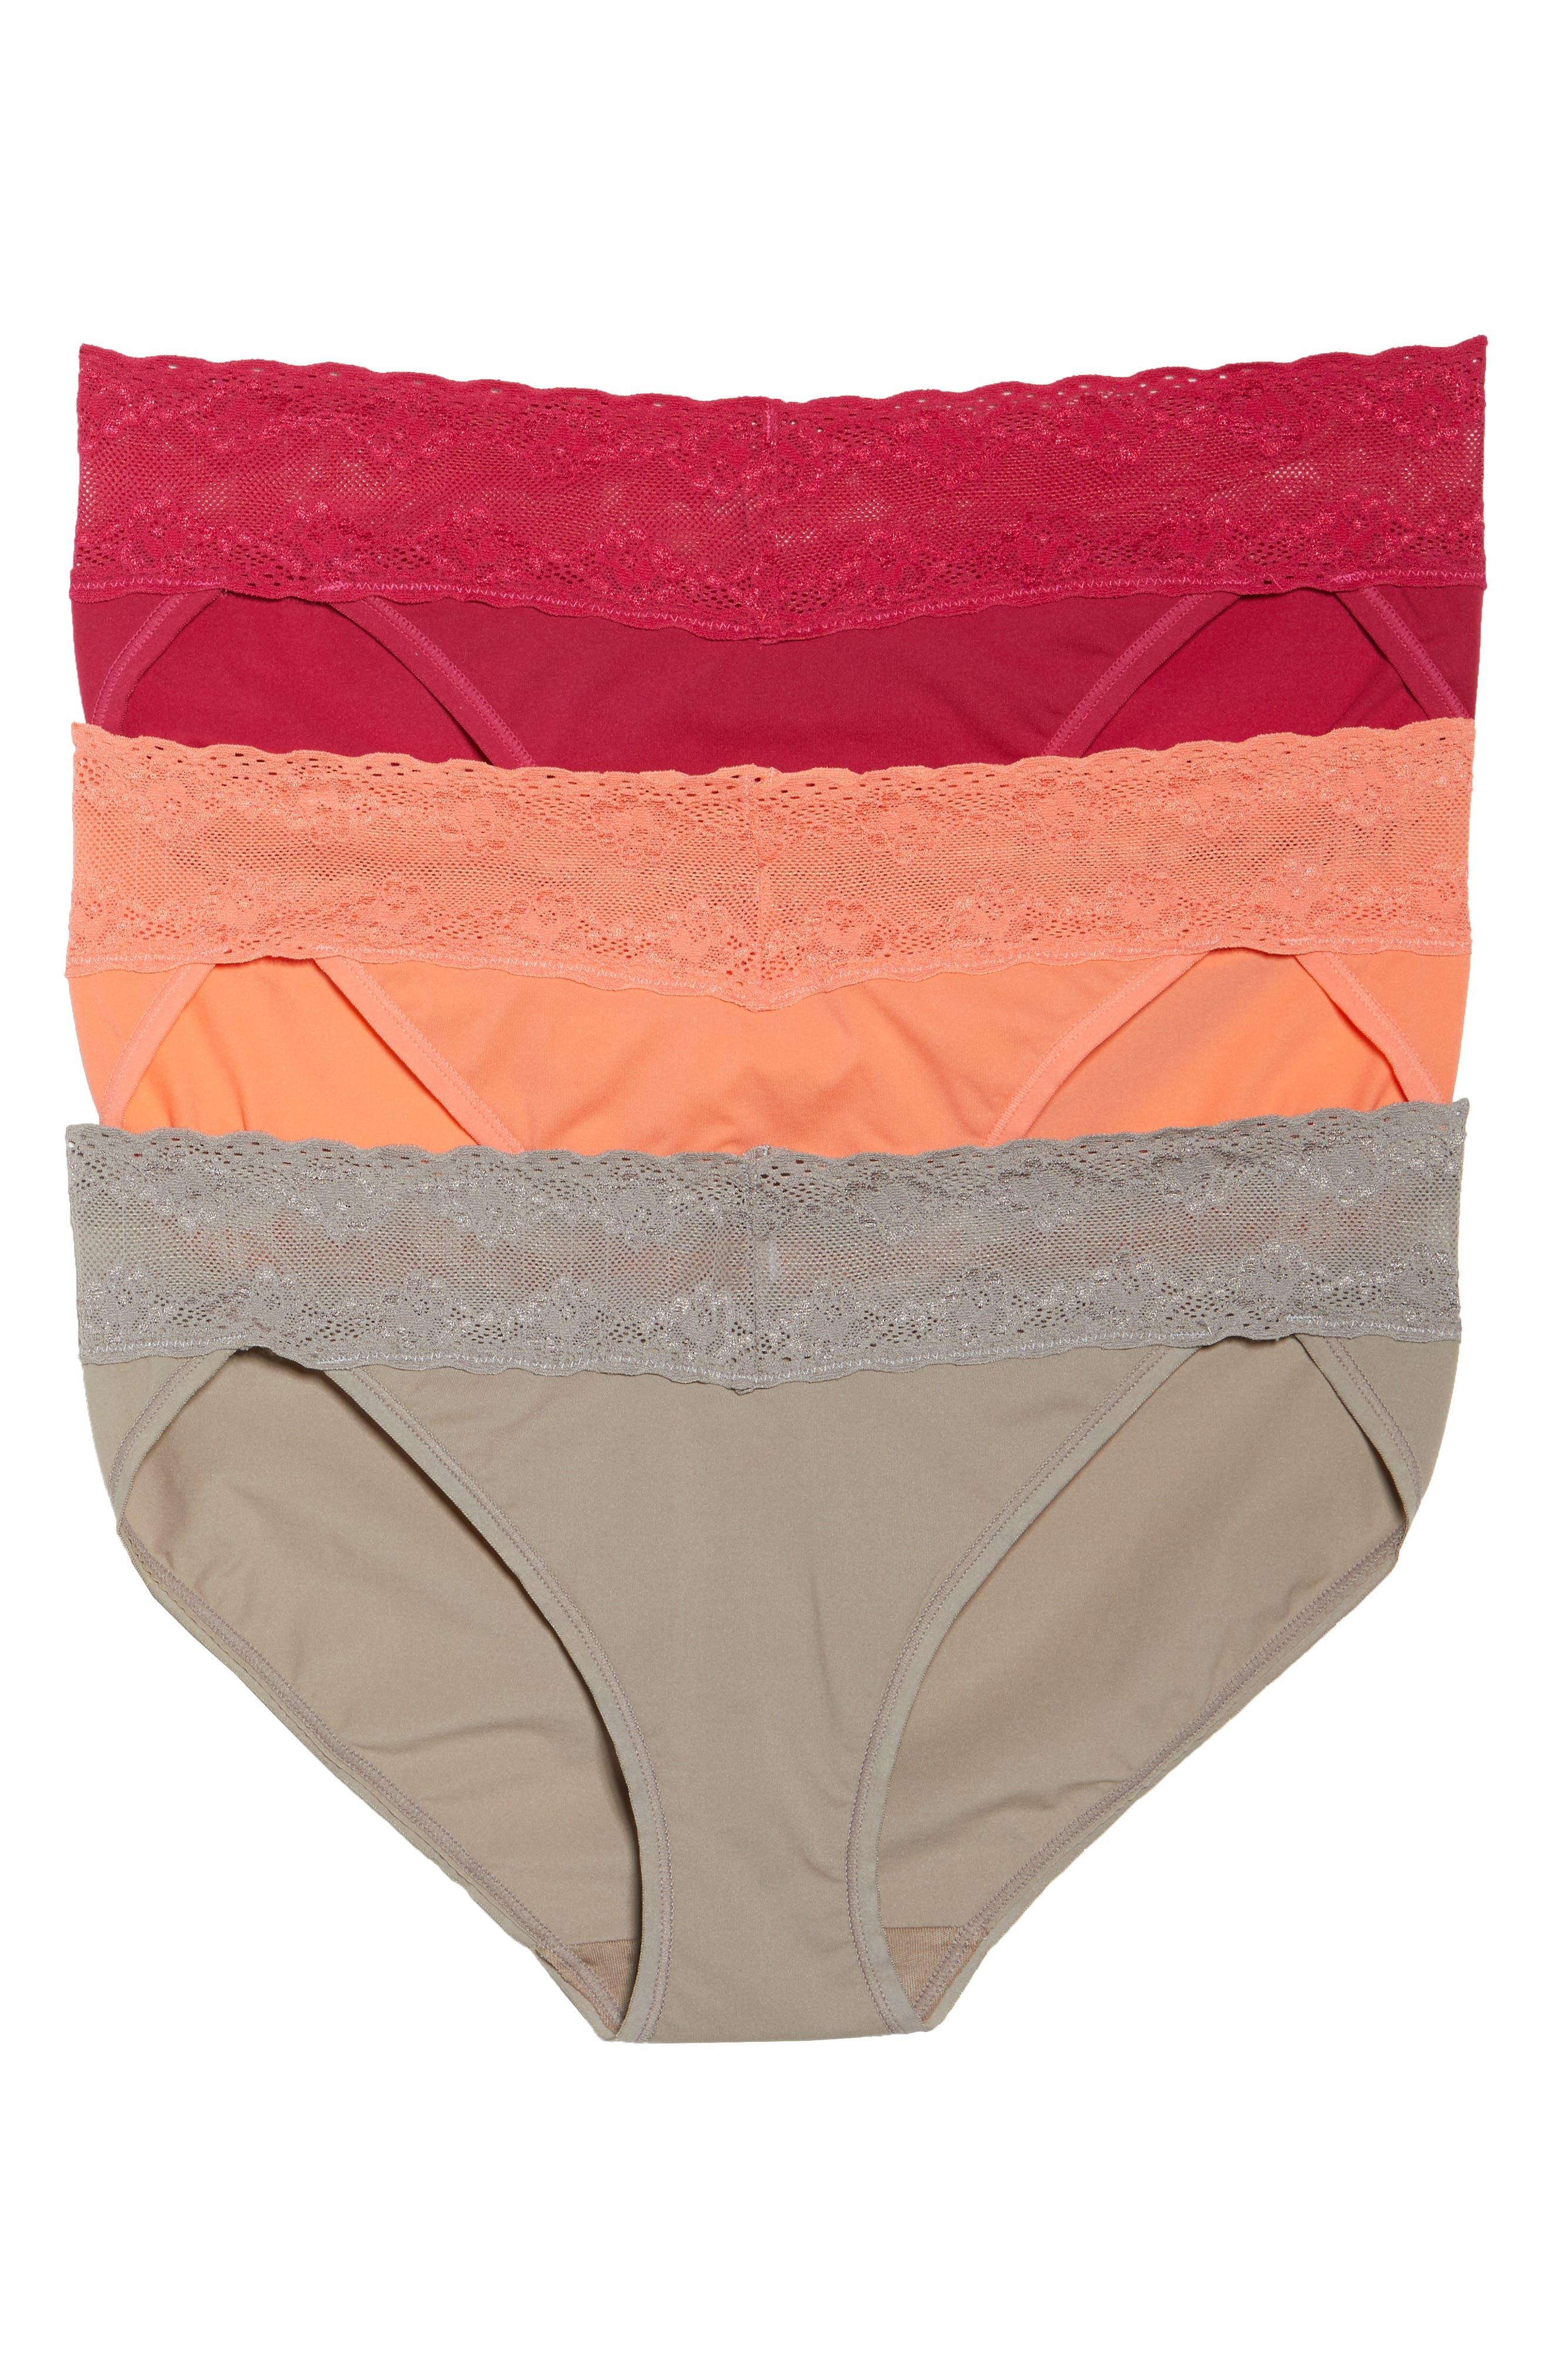 Main Image - Natori 'Bliss Perfection' Bikini Briefs (3-Pack)